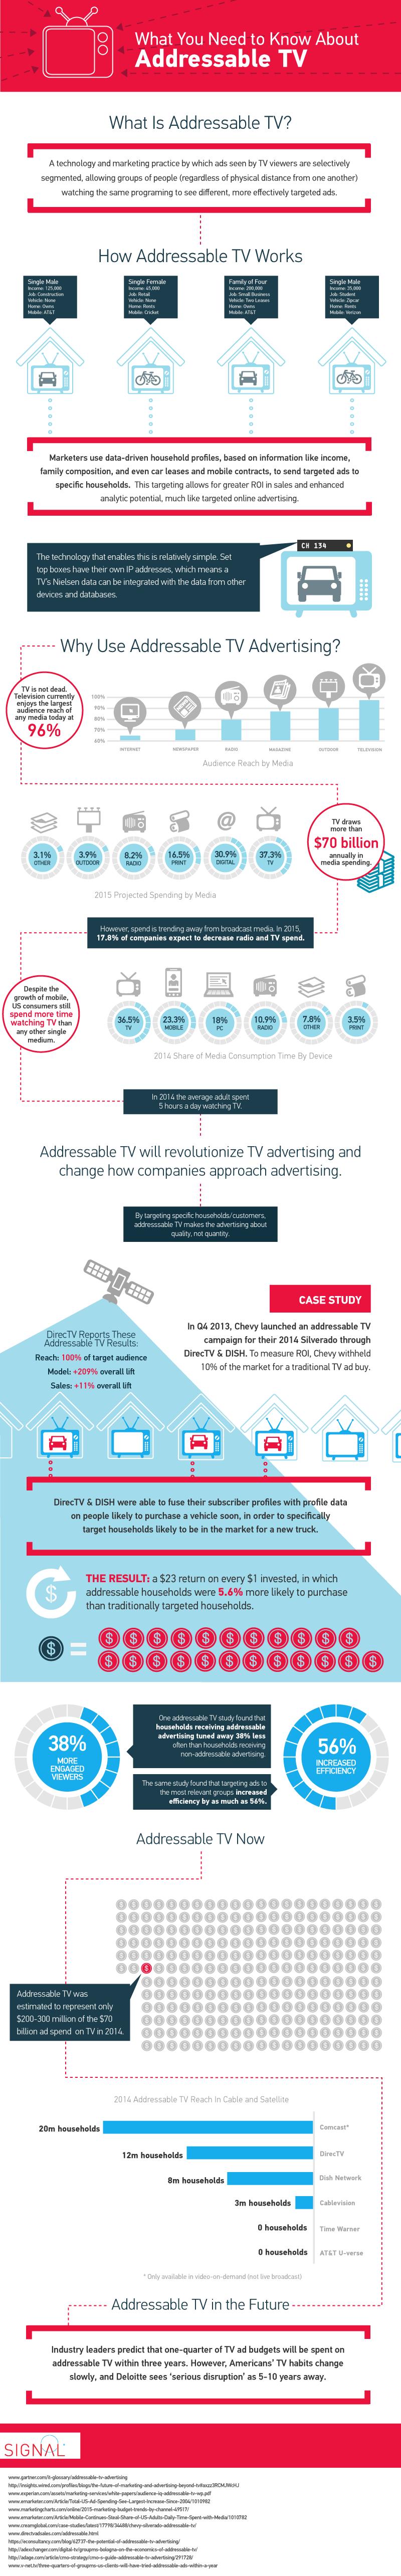 Addressable TV Infographic